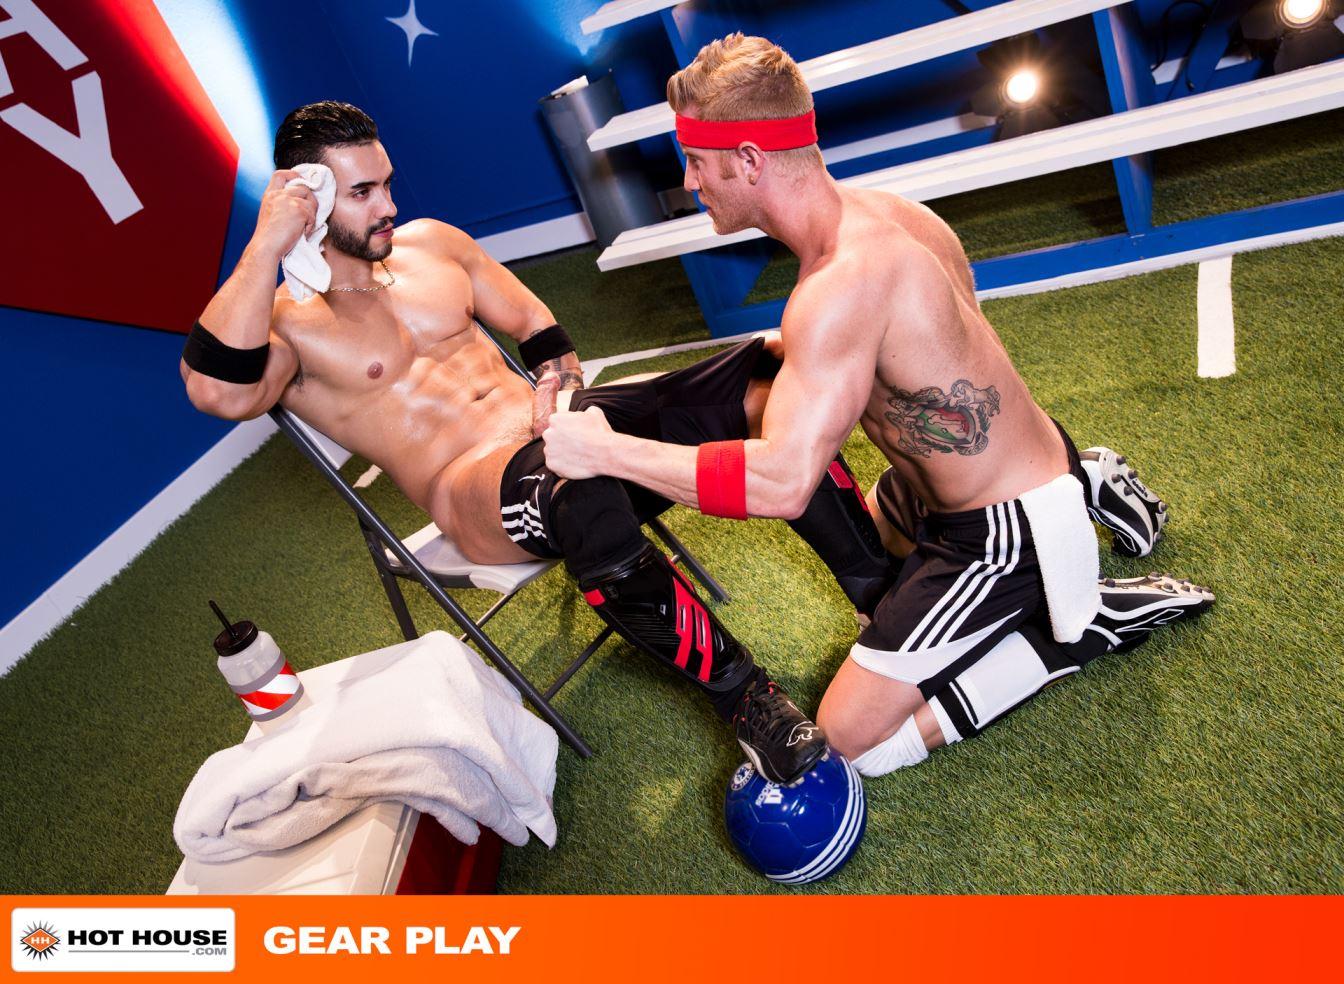 SneakerSex: Johnny V and Arad Winwin